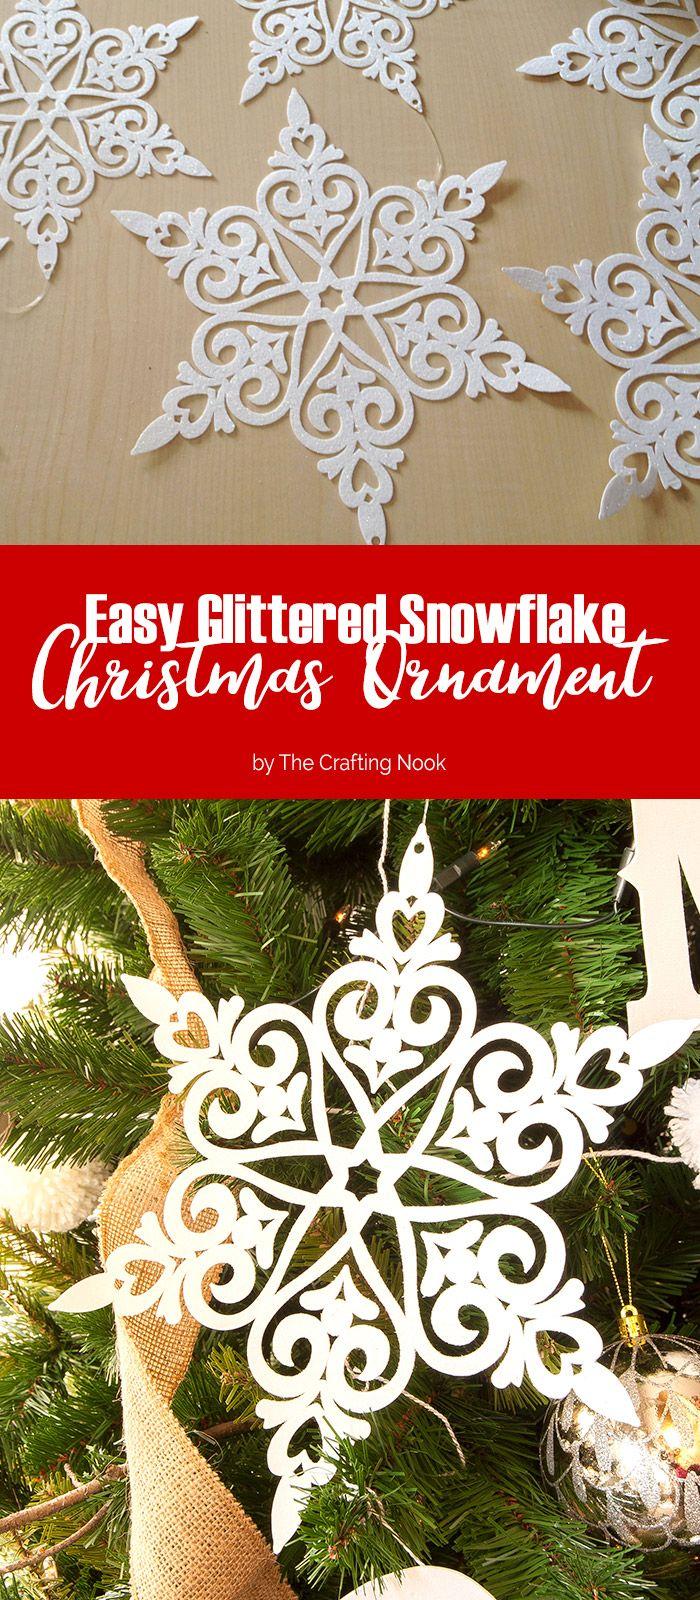 Easy Glittered Snowflake Christmas Ornaments 264 best